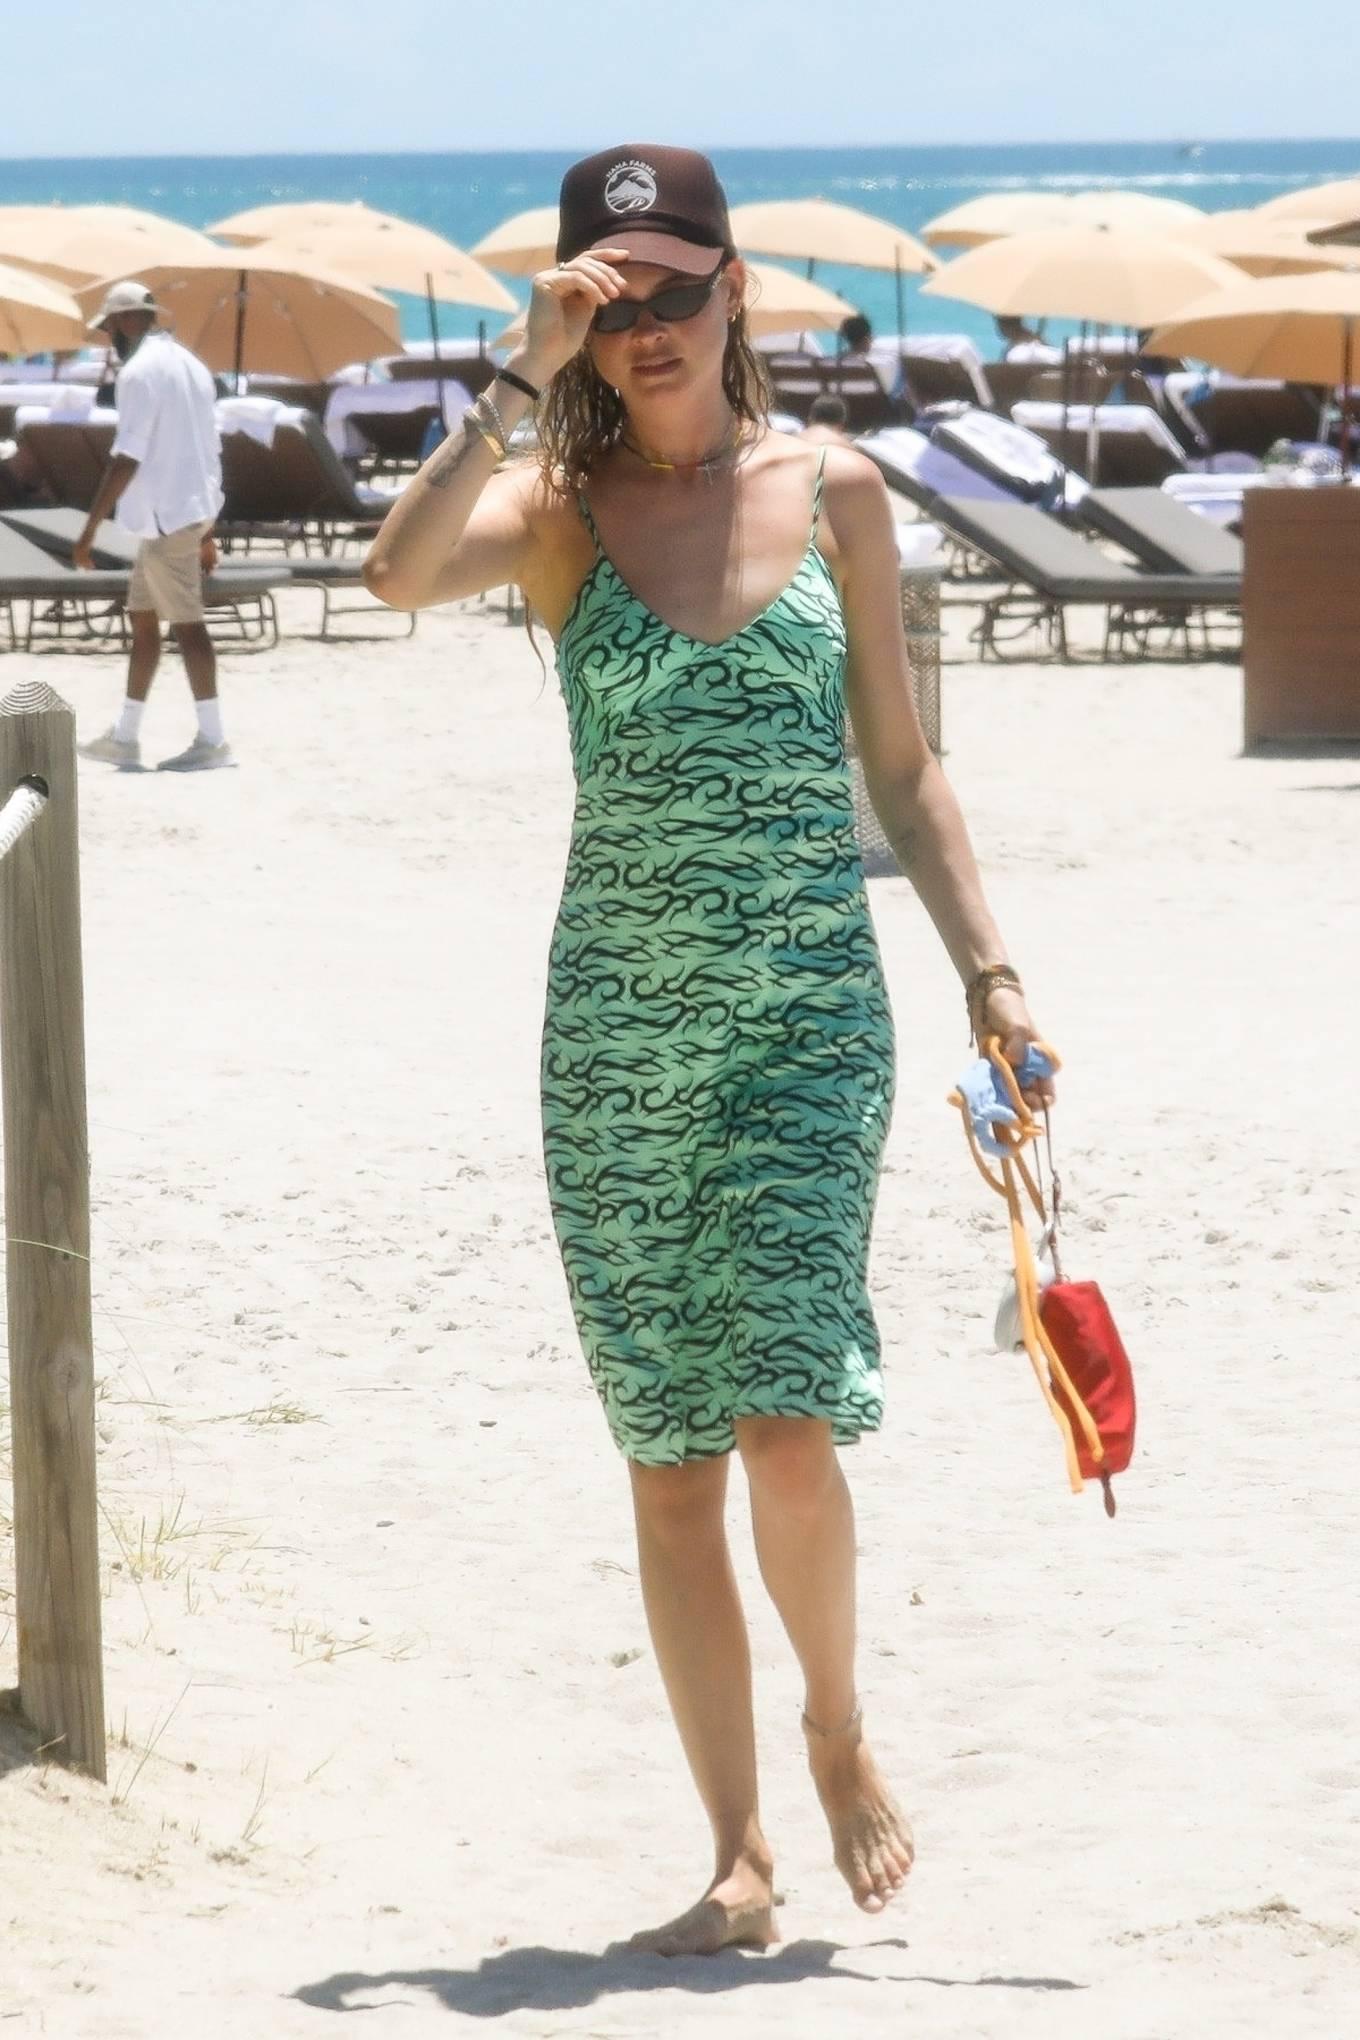 Behati Prinsloo -In a green dress in Miami Beach